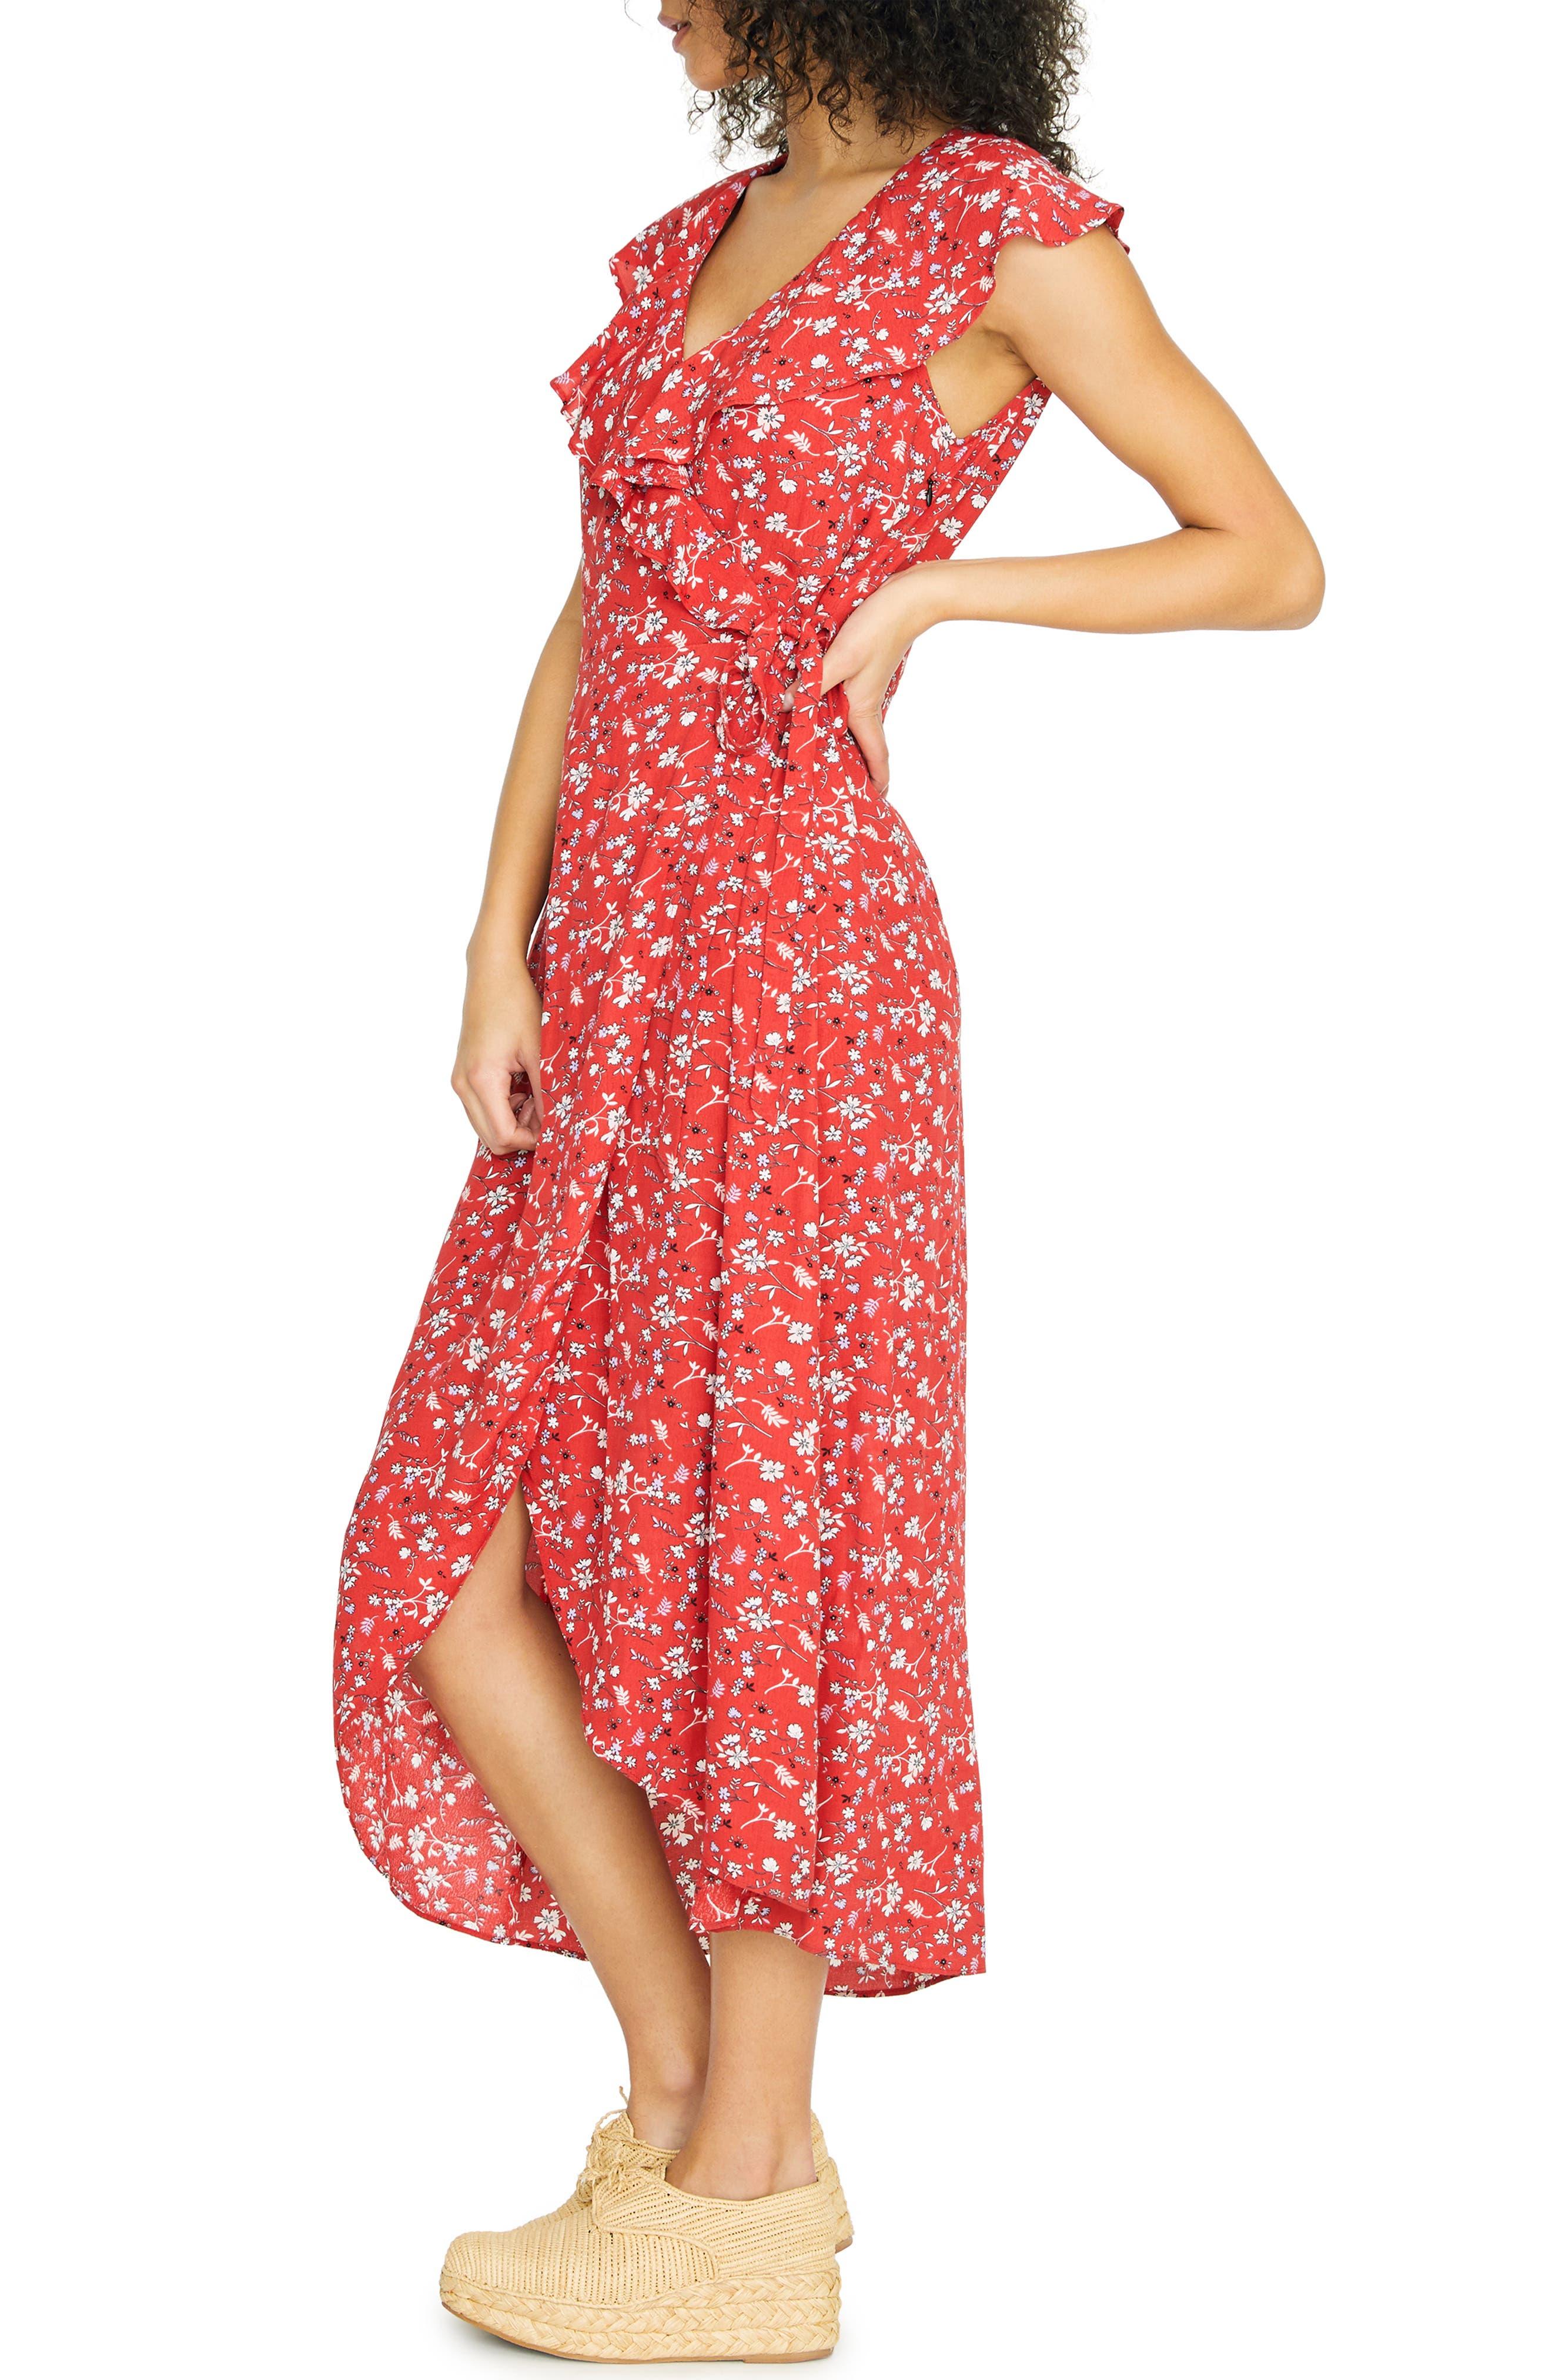 SANCTUARY, Jolynn Faux Wrap Midi Dress, Alternate thumbnail 4, color, SIMPLY RED